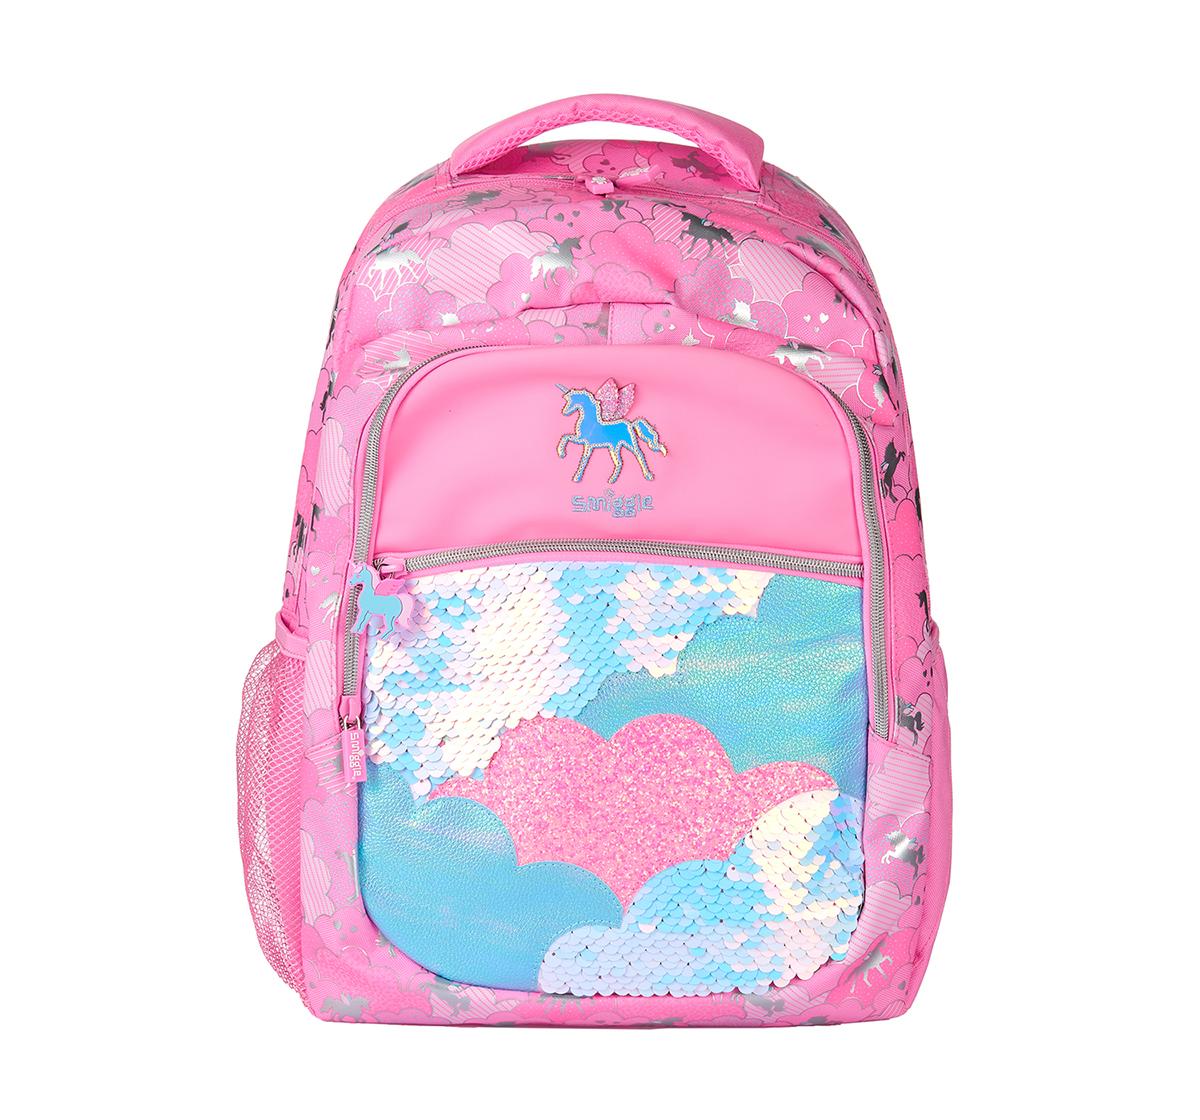 Smiggle   Smiggle Lunar Backpack - Unicorn Print Bags for Kids age 3Y+ (Pink)